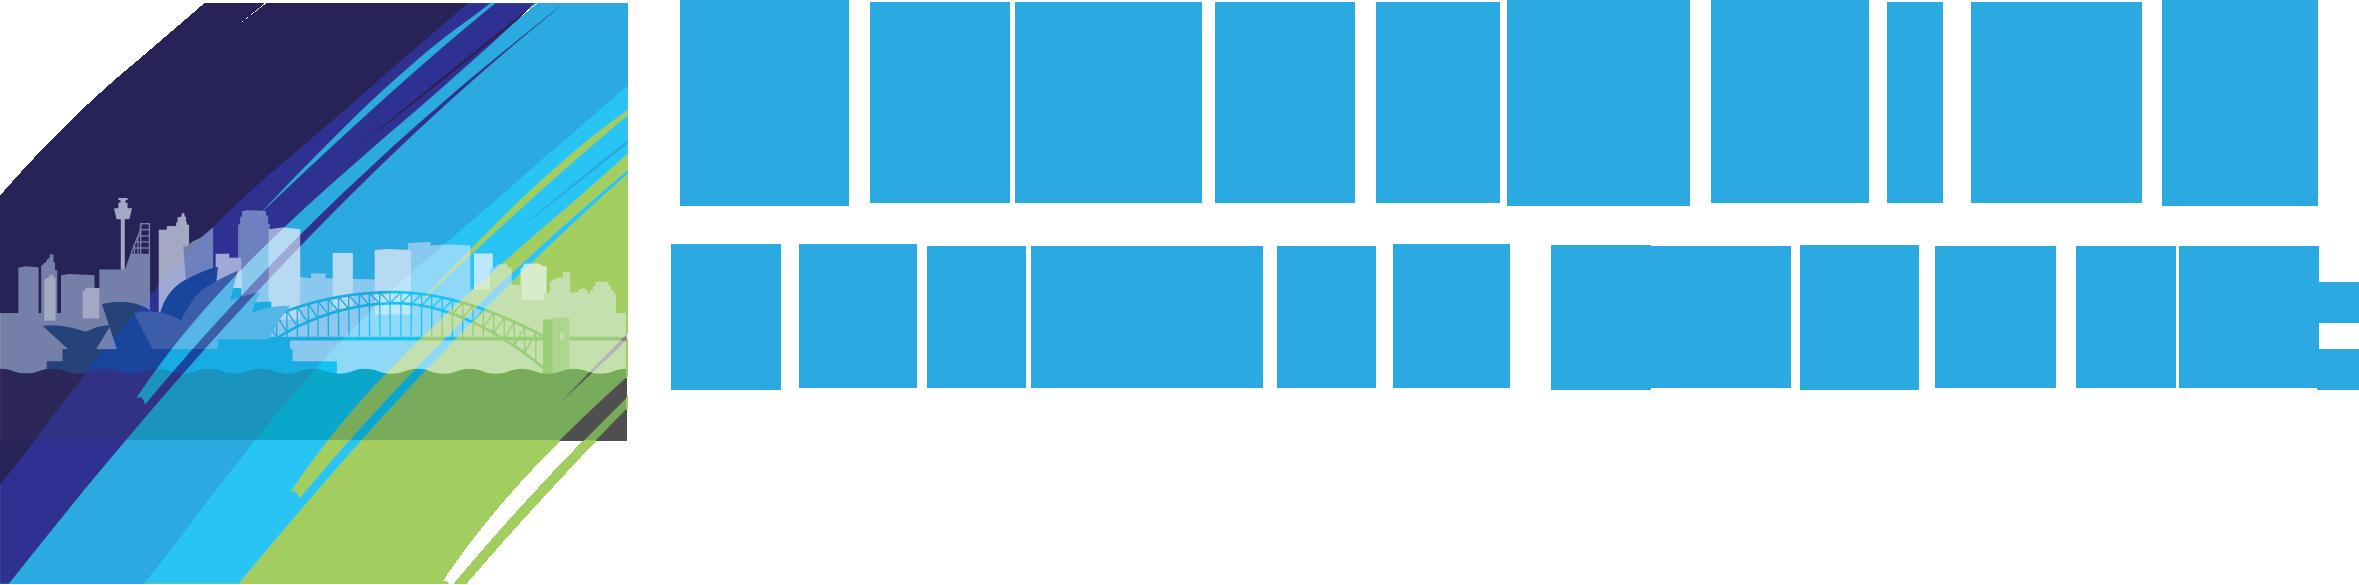 Developing Greater Sydney